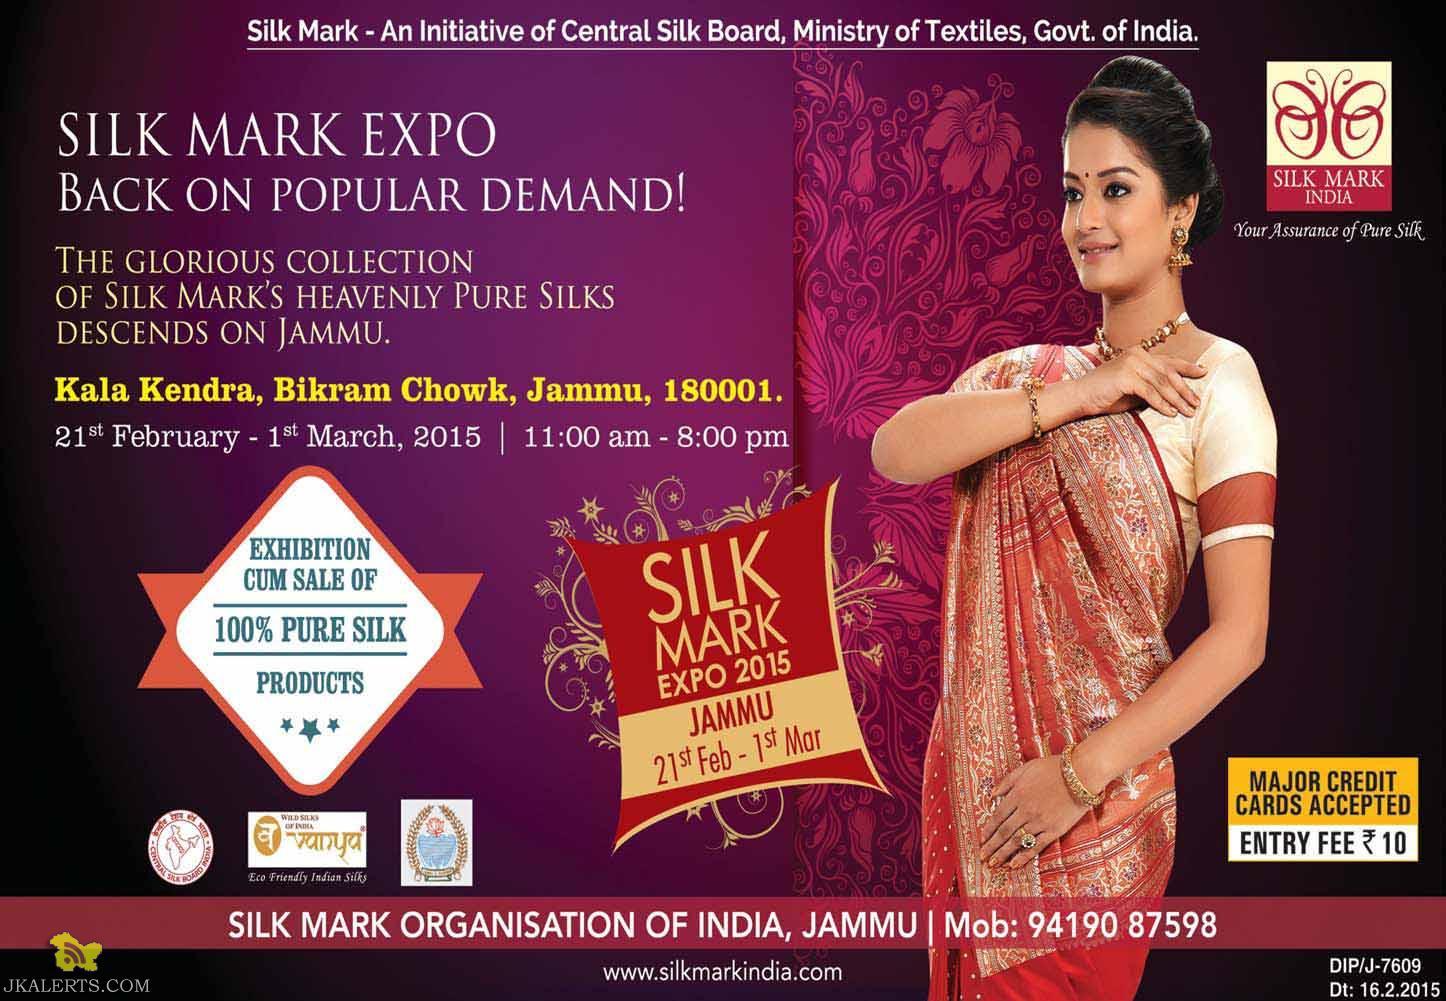 Silk Mark Expo